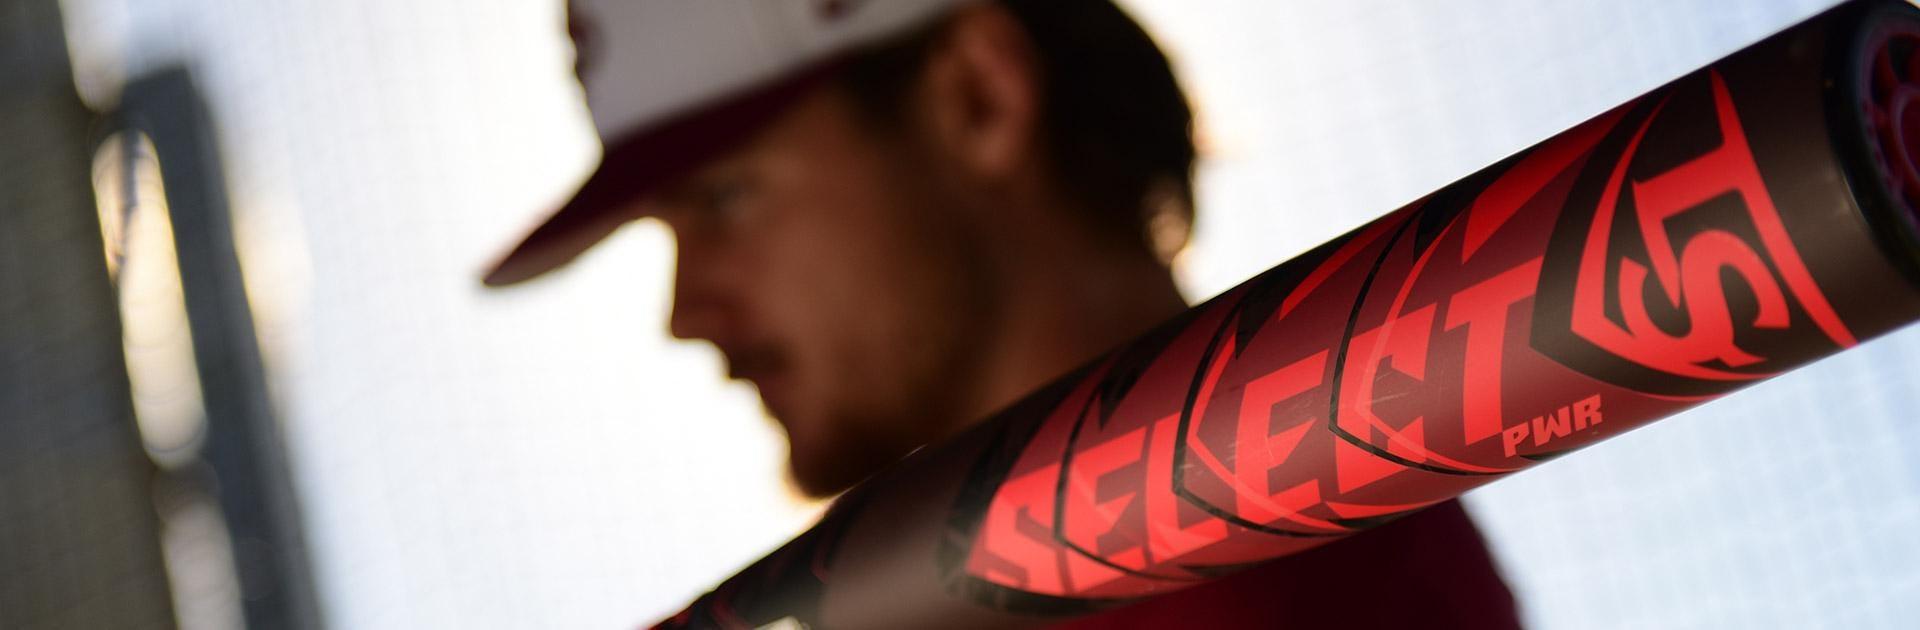 select-pwr-baseball-bat-bros-review